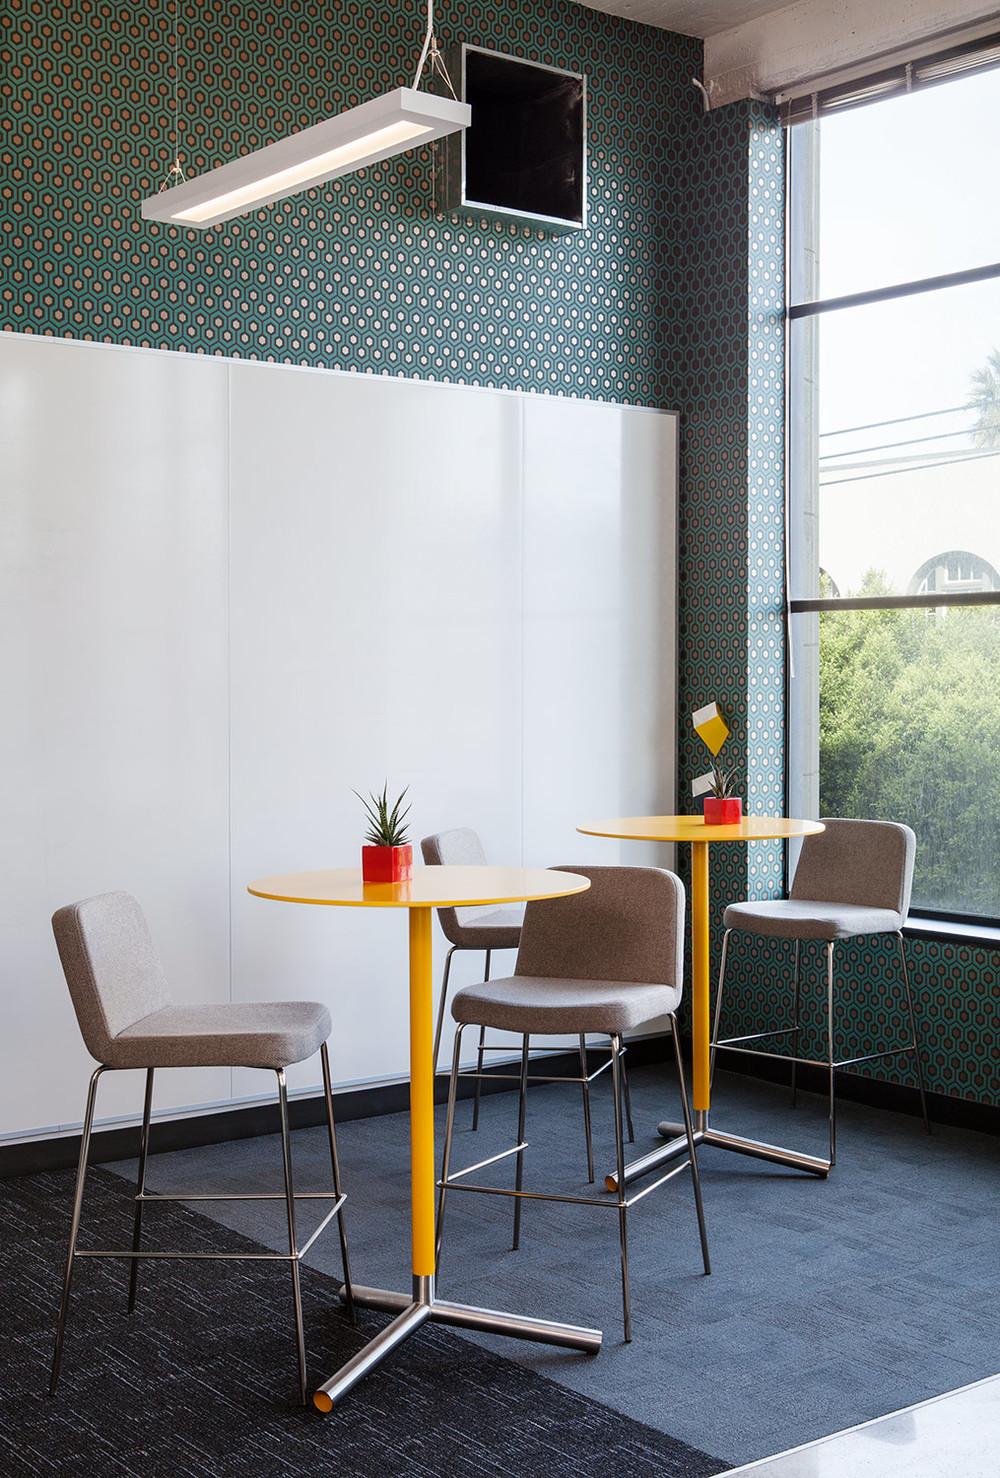 Janel Holiday Interior Design